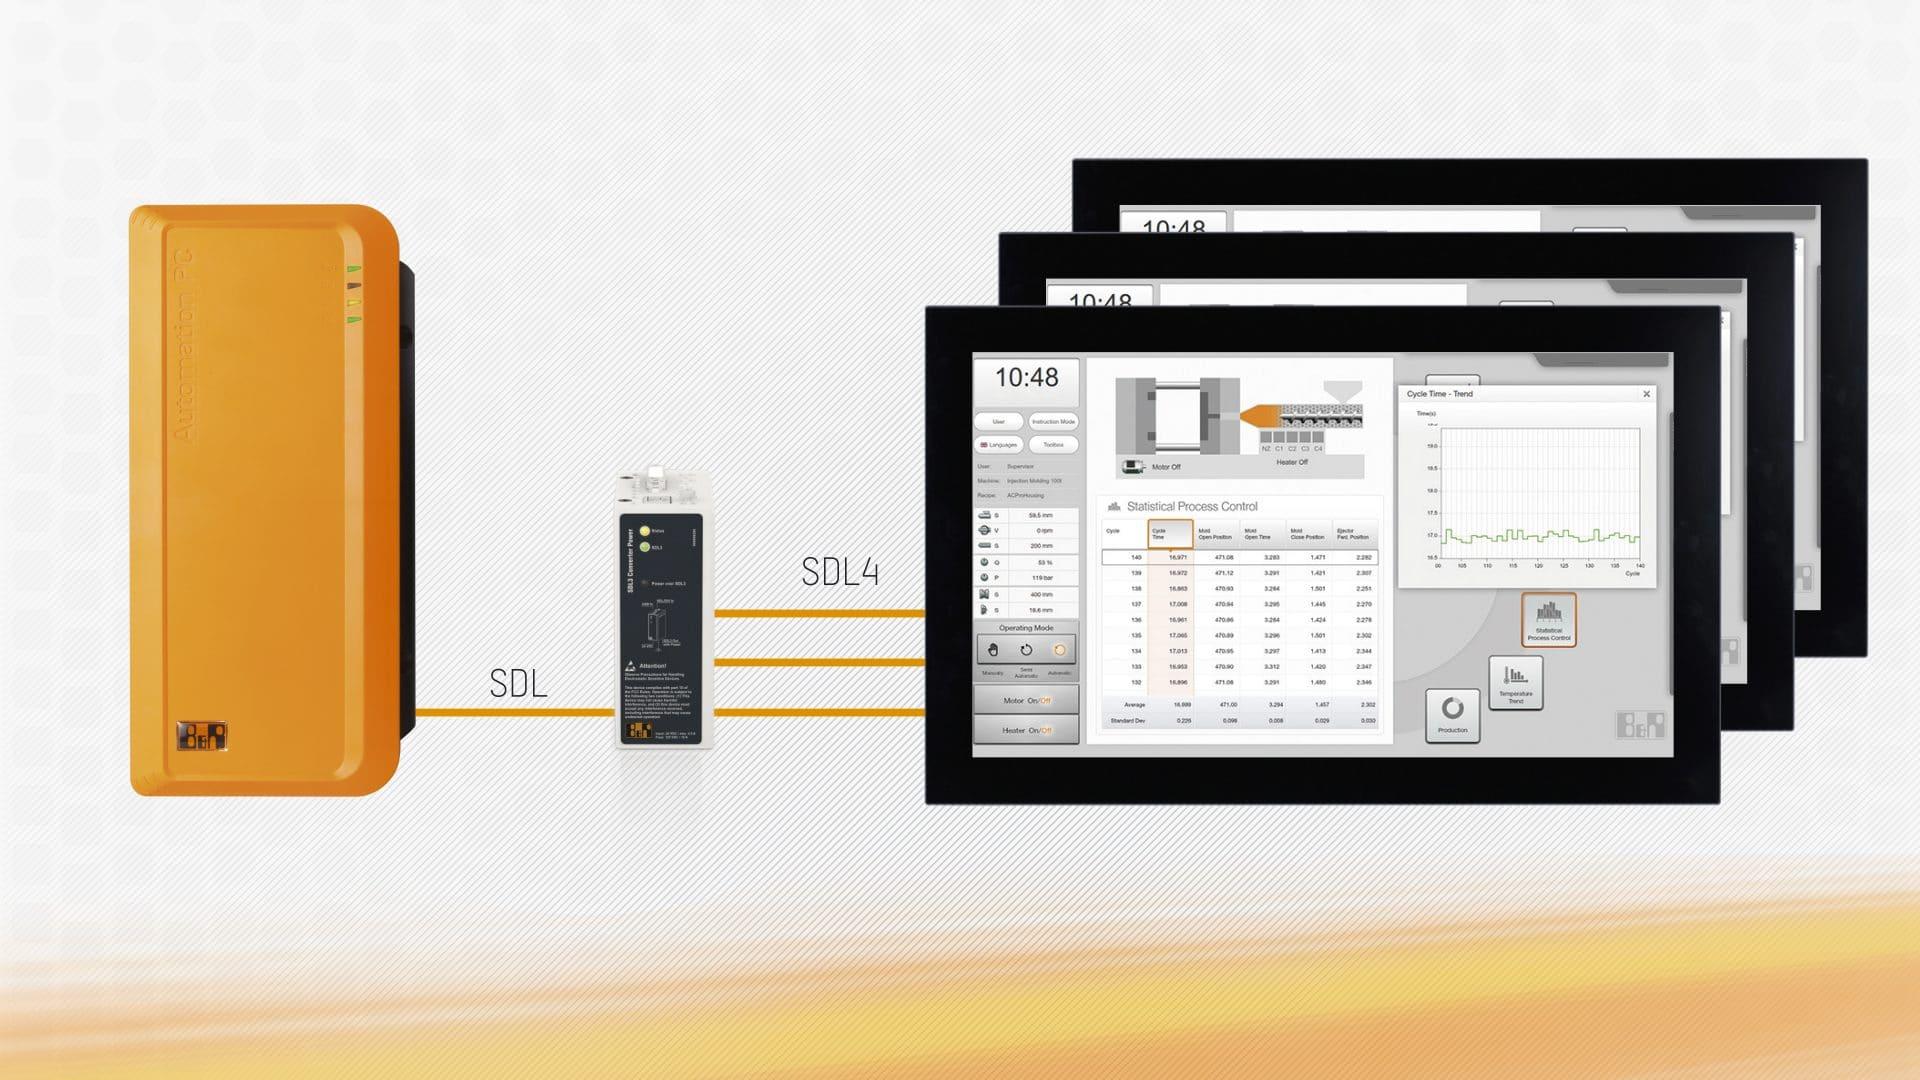 Digital display transmission with SDL4